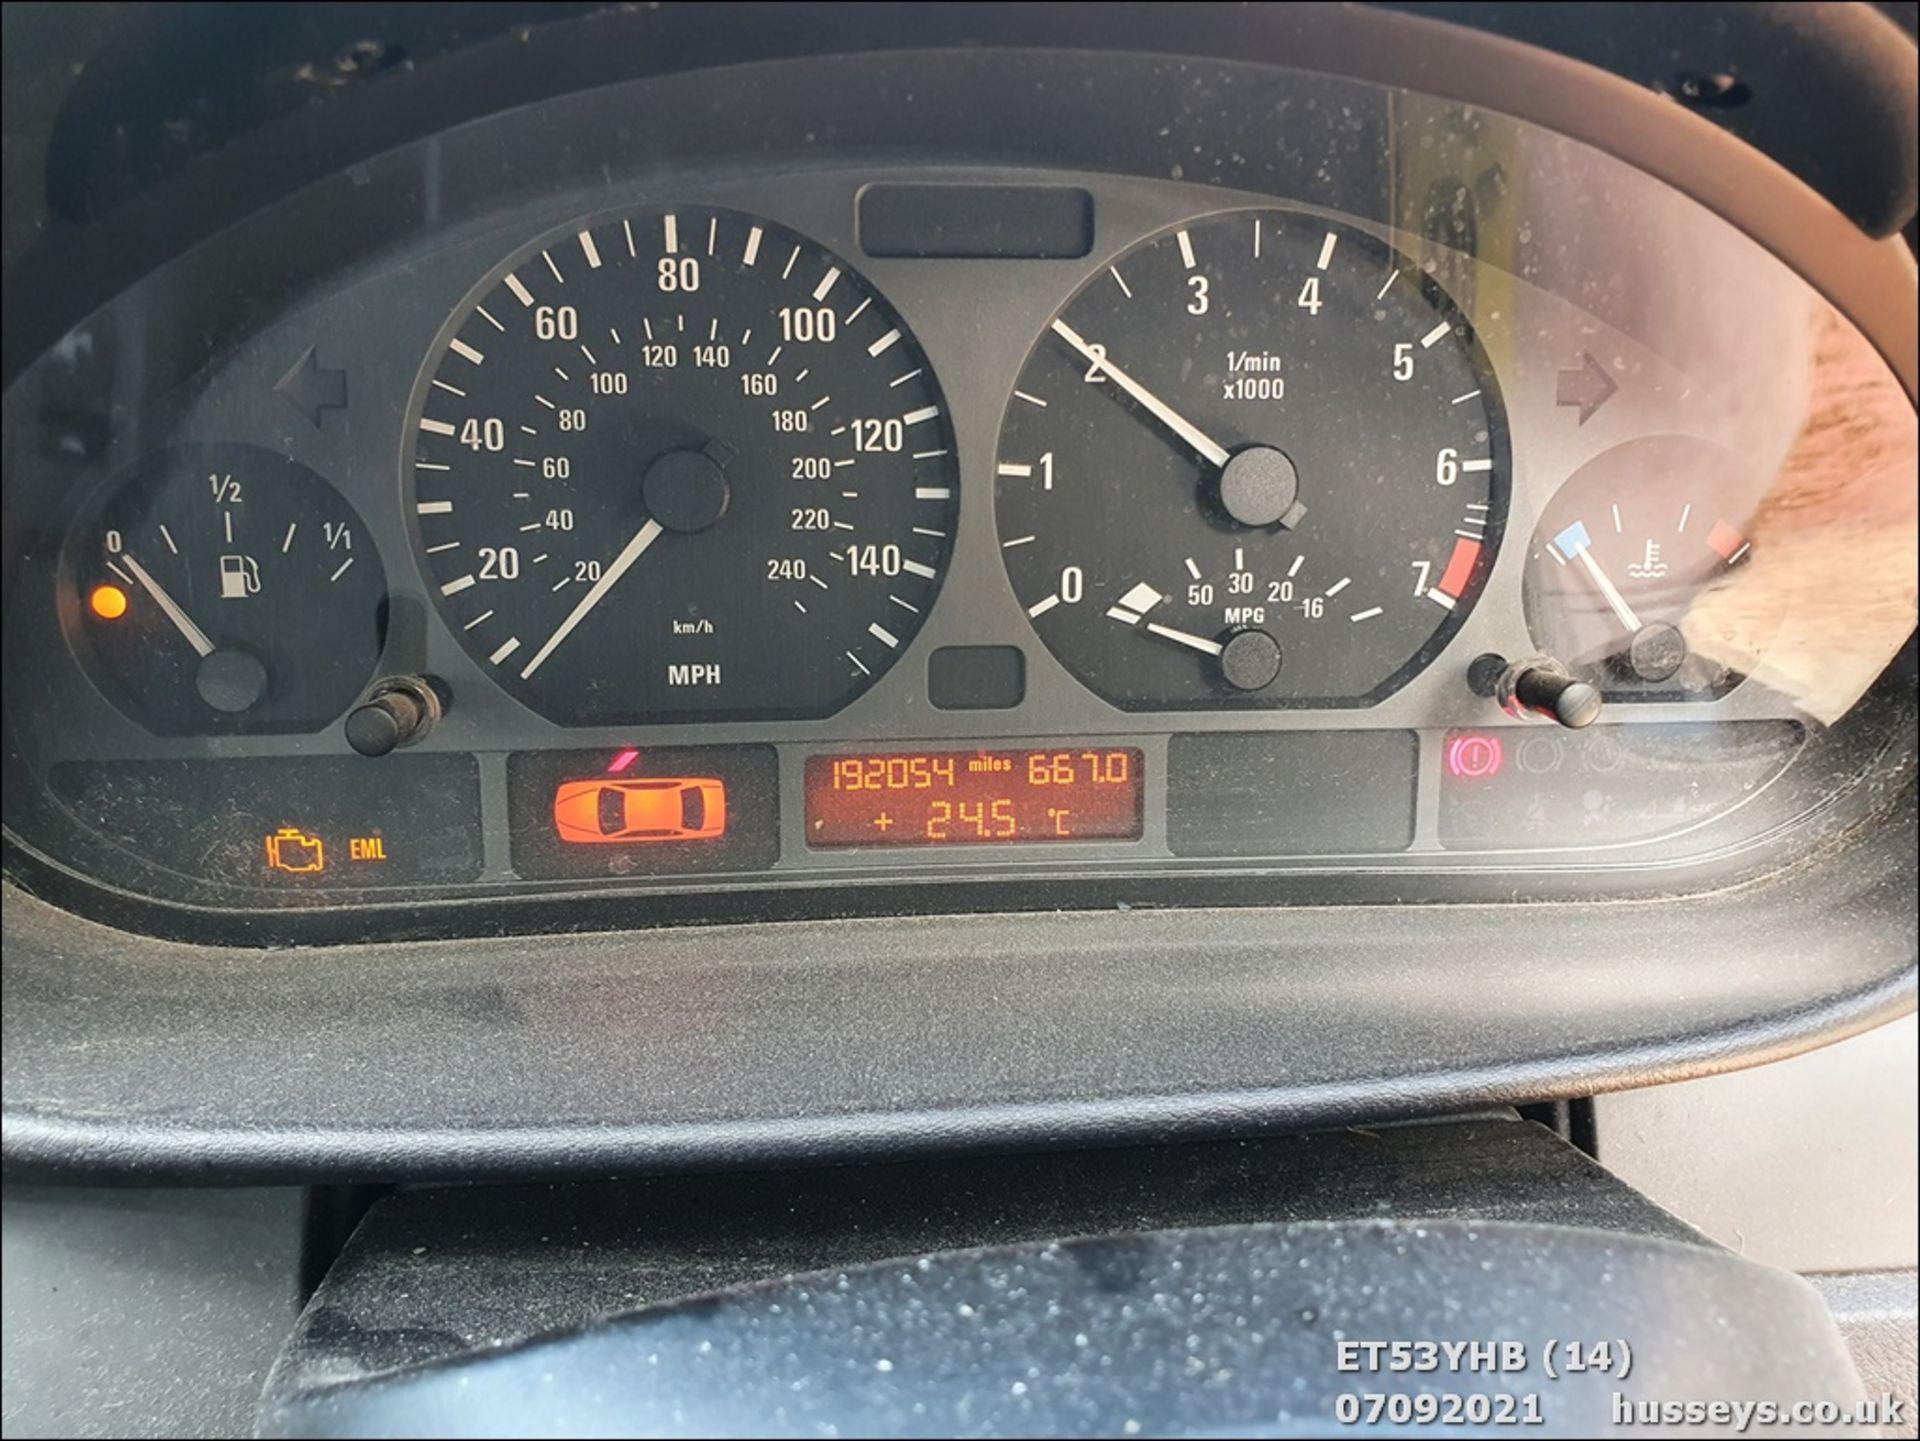 04/53 BMW 318I SE TOURING - 1995cc 5dr Estate (Grey) - Image 14 of 16